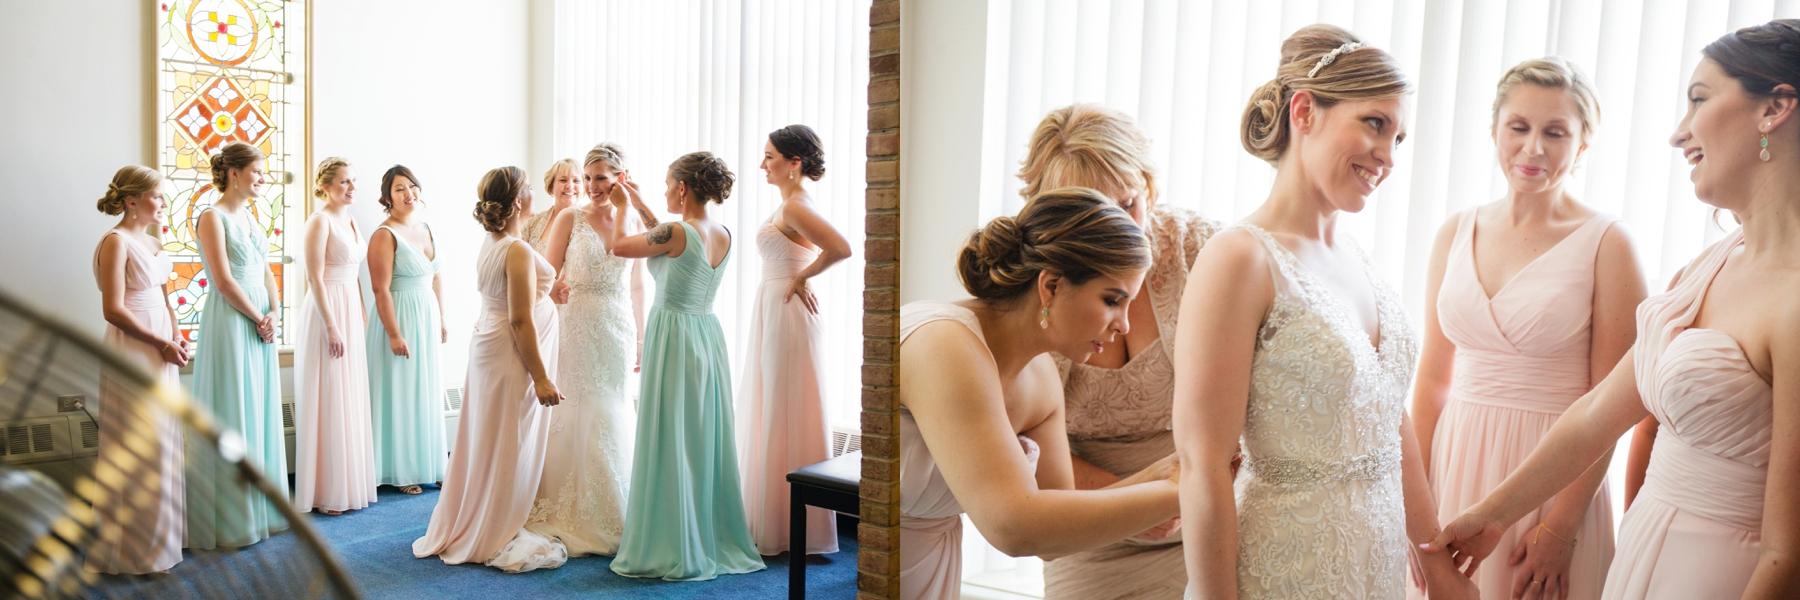 Ben_Jillian_Midland_Baycity_Wedding_0024.jpg